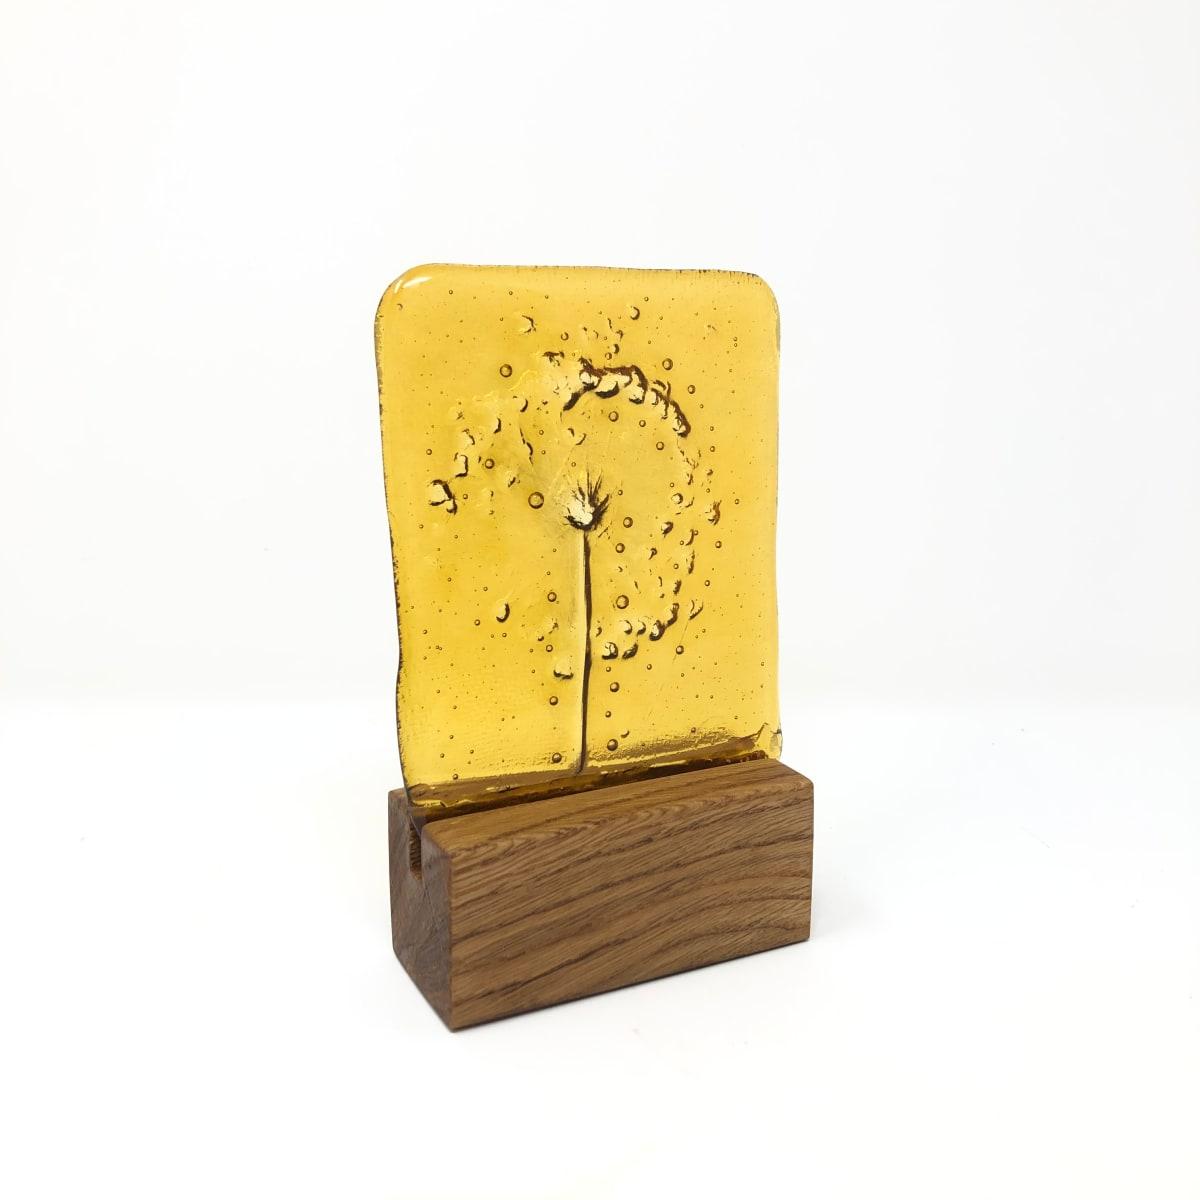 SHI316, Medium Amber Single Allium block by Hilary Shields